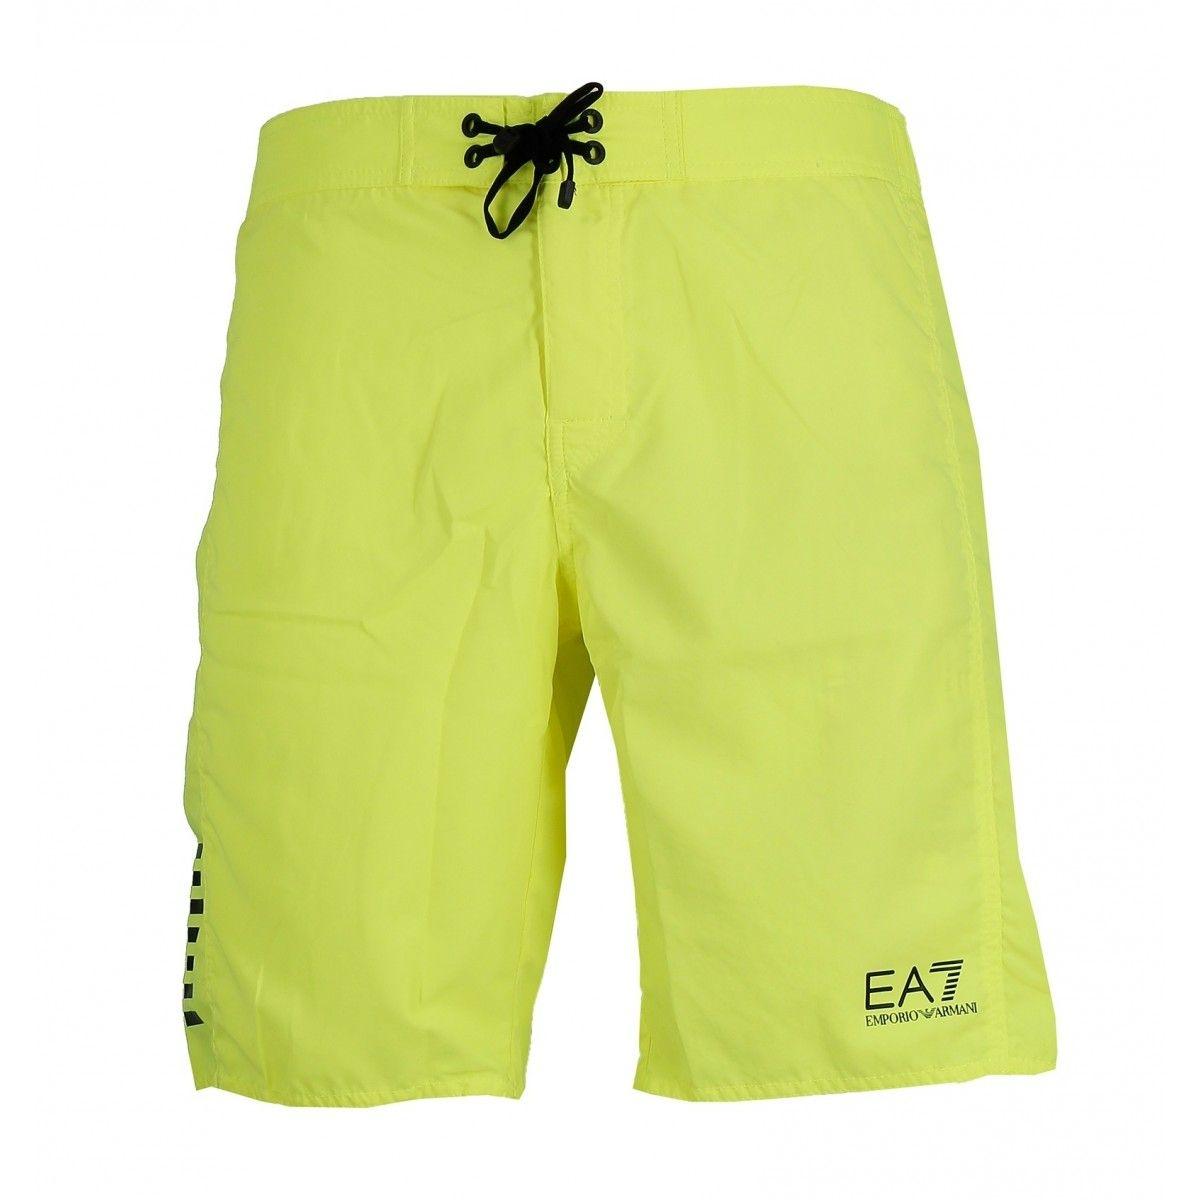 Short de bain EA7 Emporio Armani (Jaune)